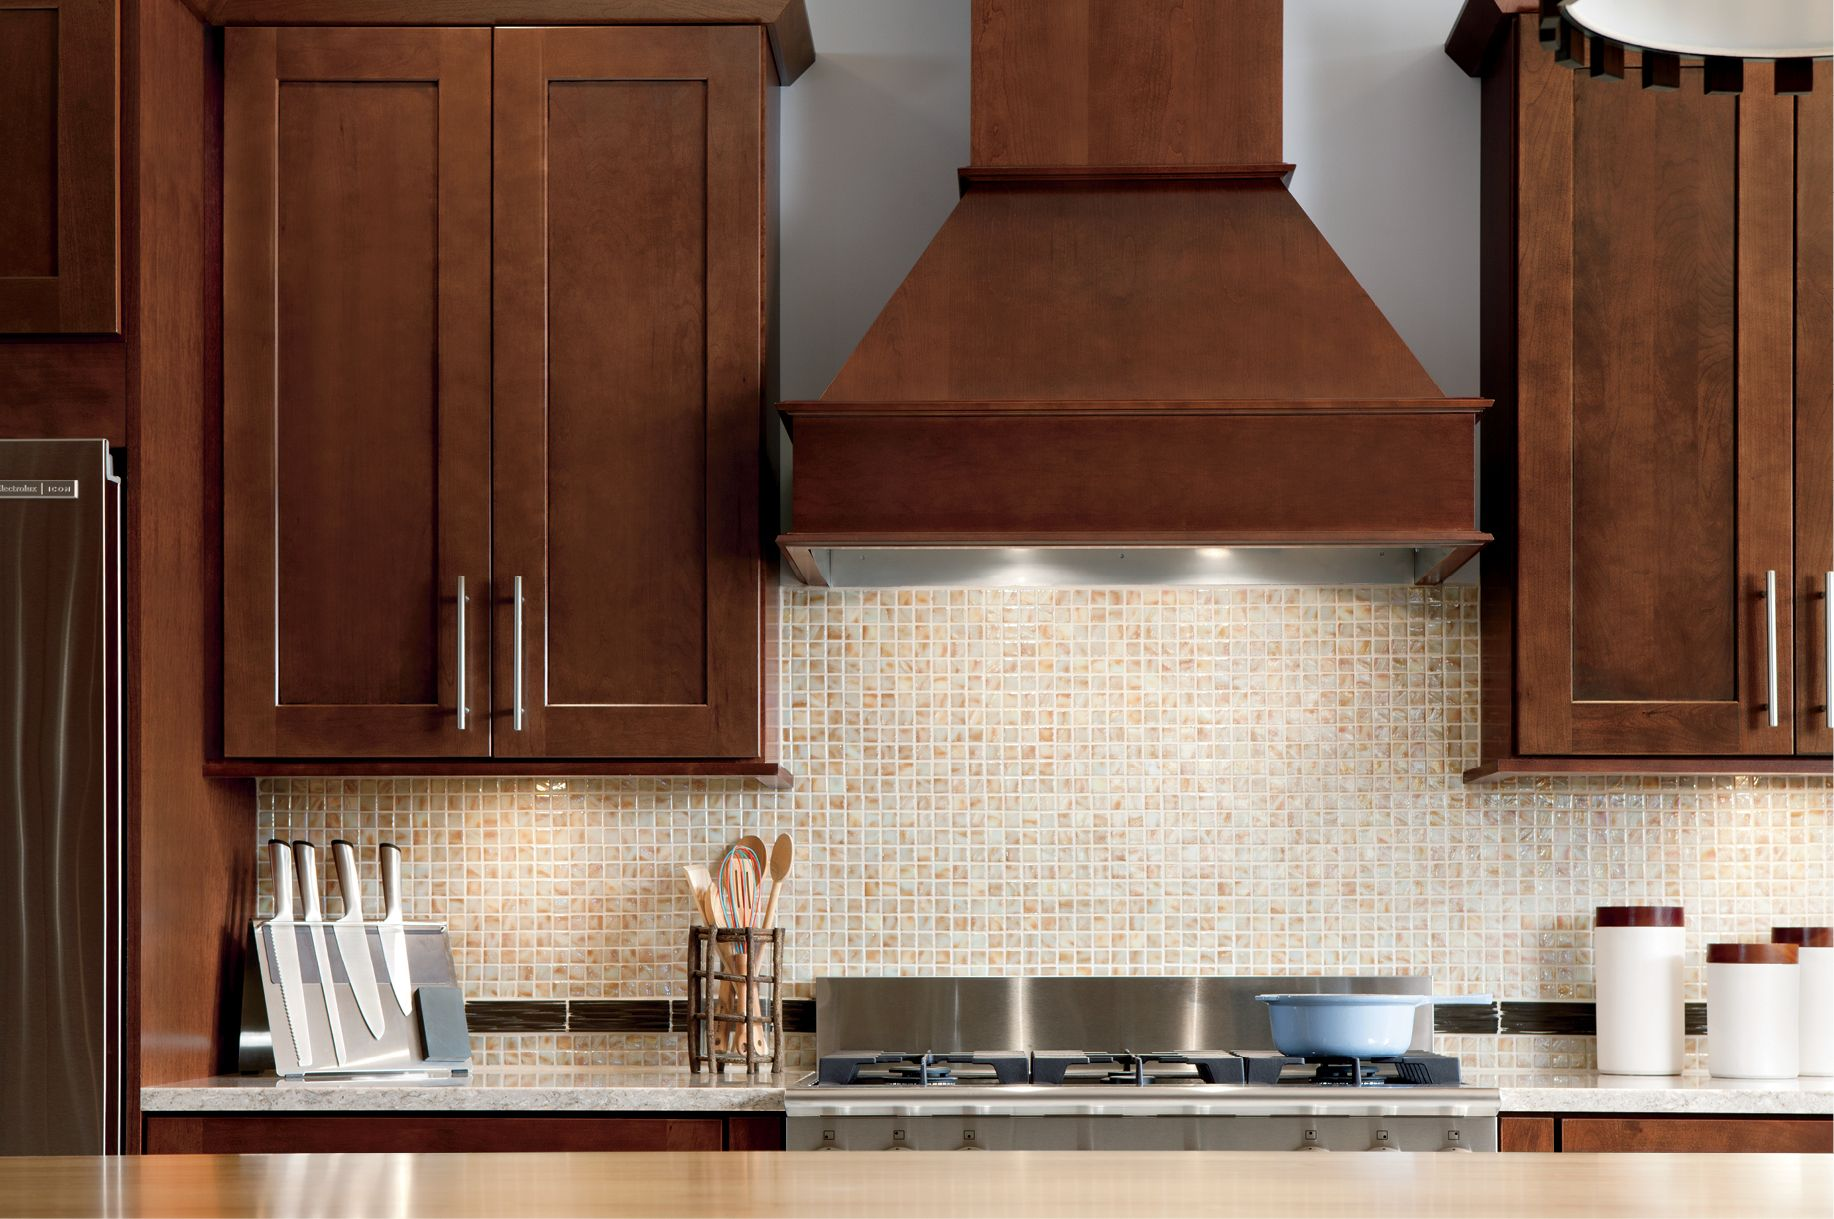 Straight Valance Range Hood Design By Allen Roth Range Hood Cabinetry Design